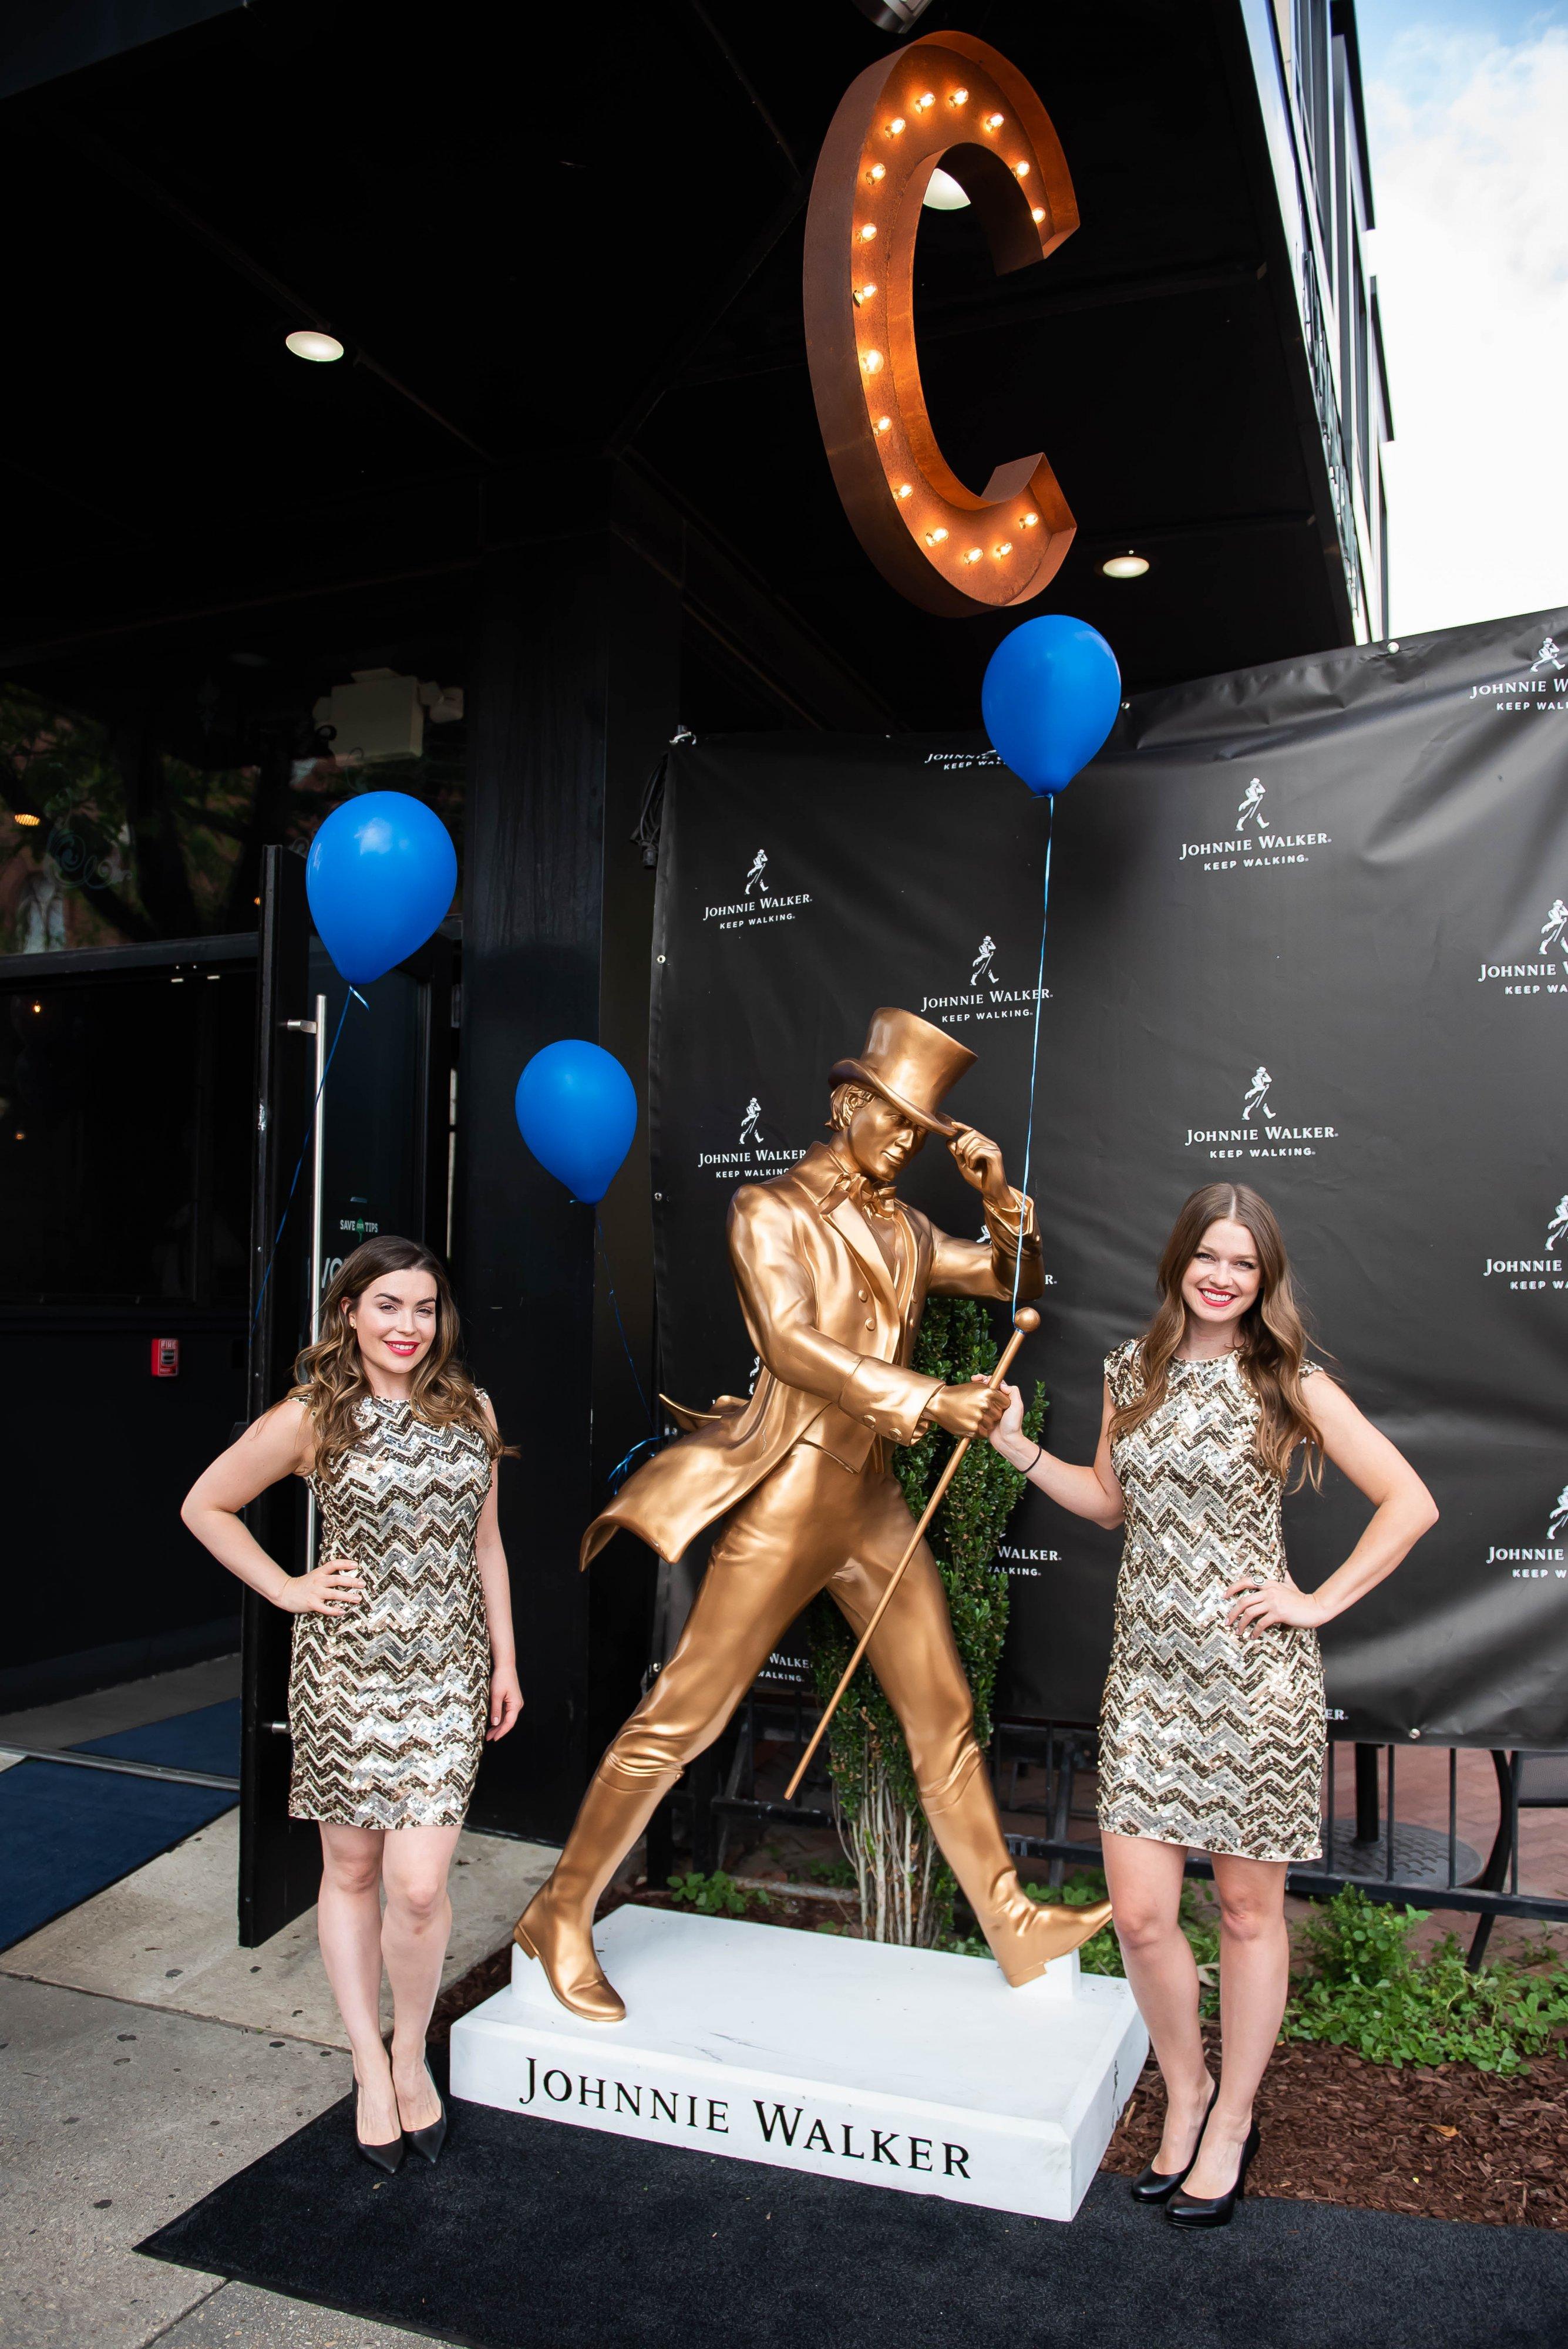 Photos: Johnnie Walker Keep Walking Statue Reveal